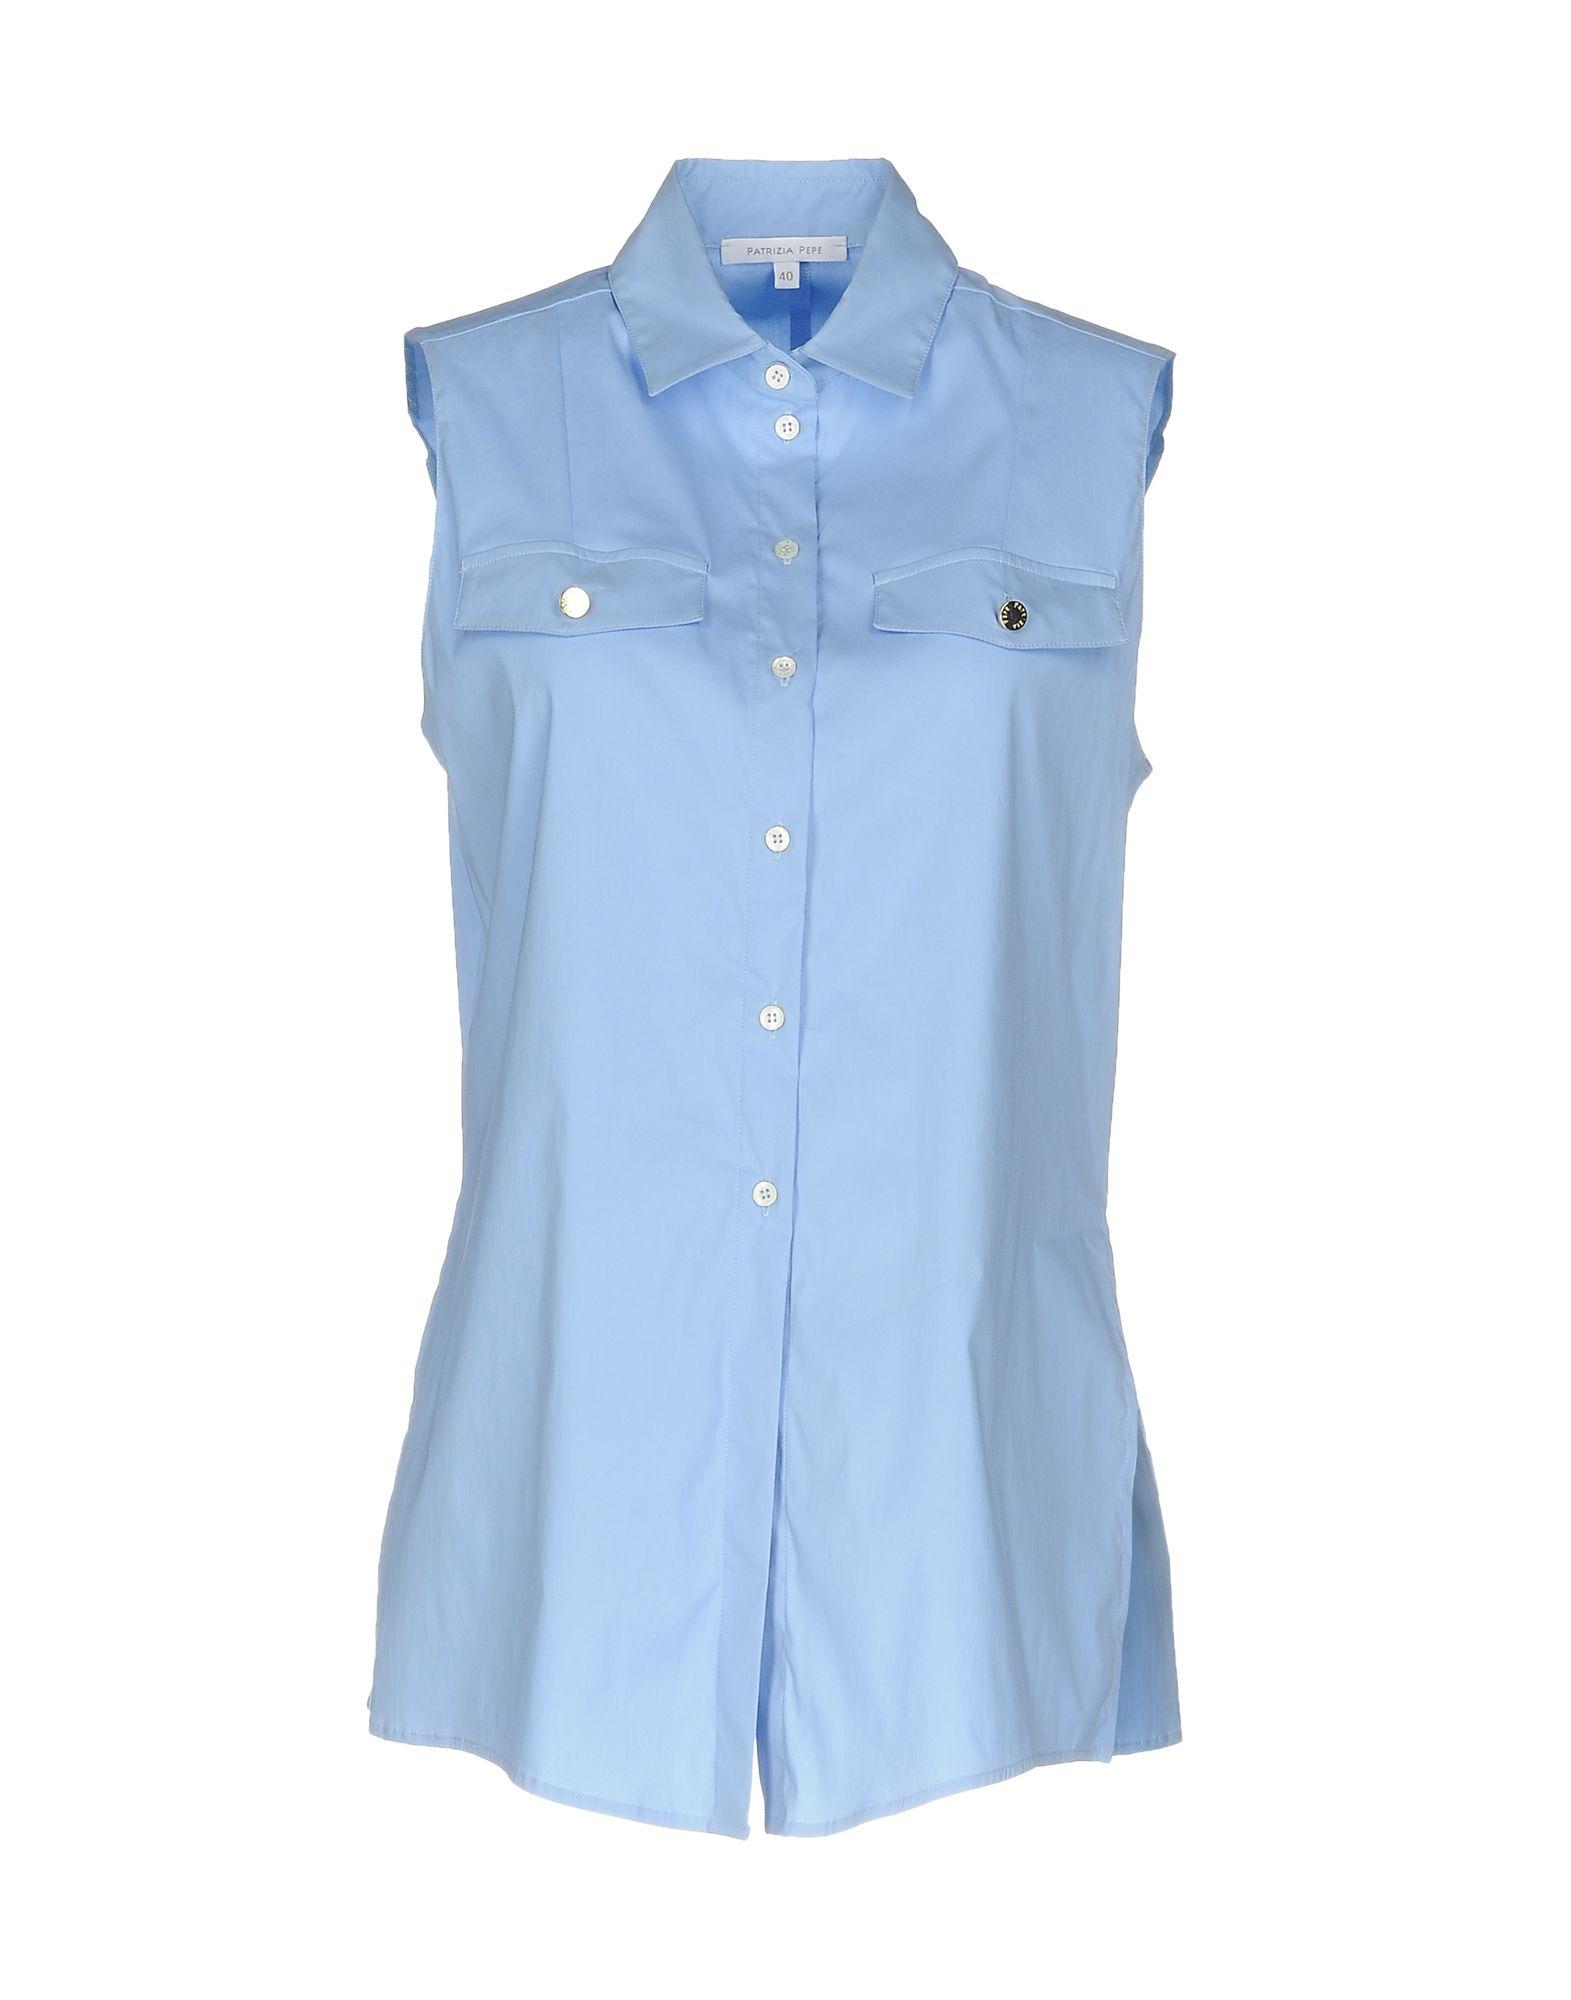 PATRIZIA PEPE Damen Hemd Farbe Himmelblau Größe 3